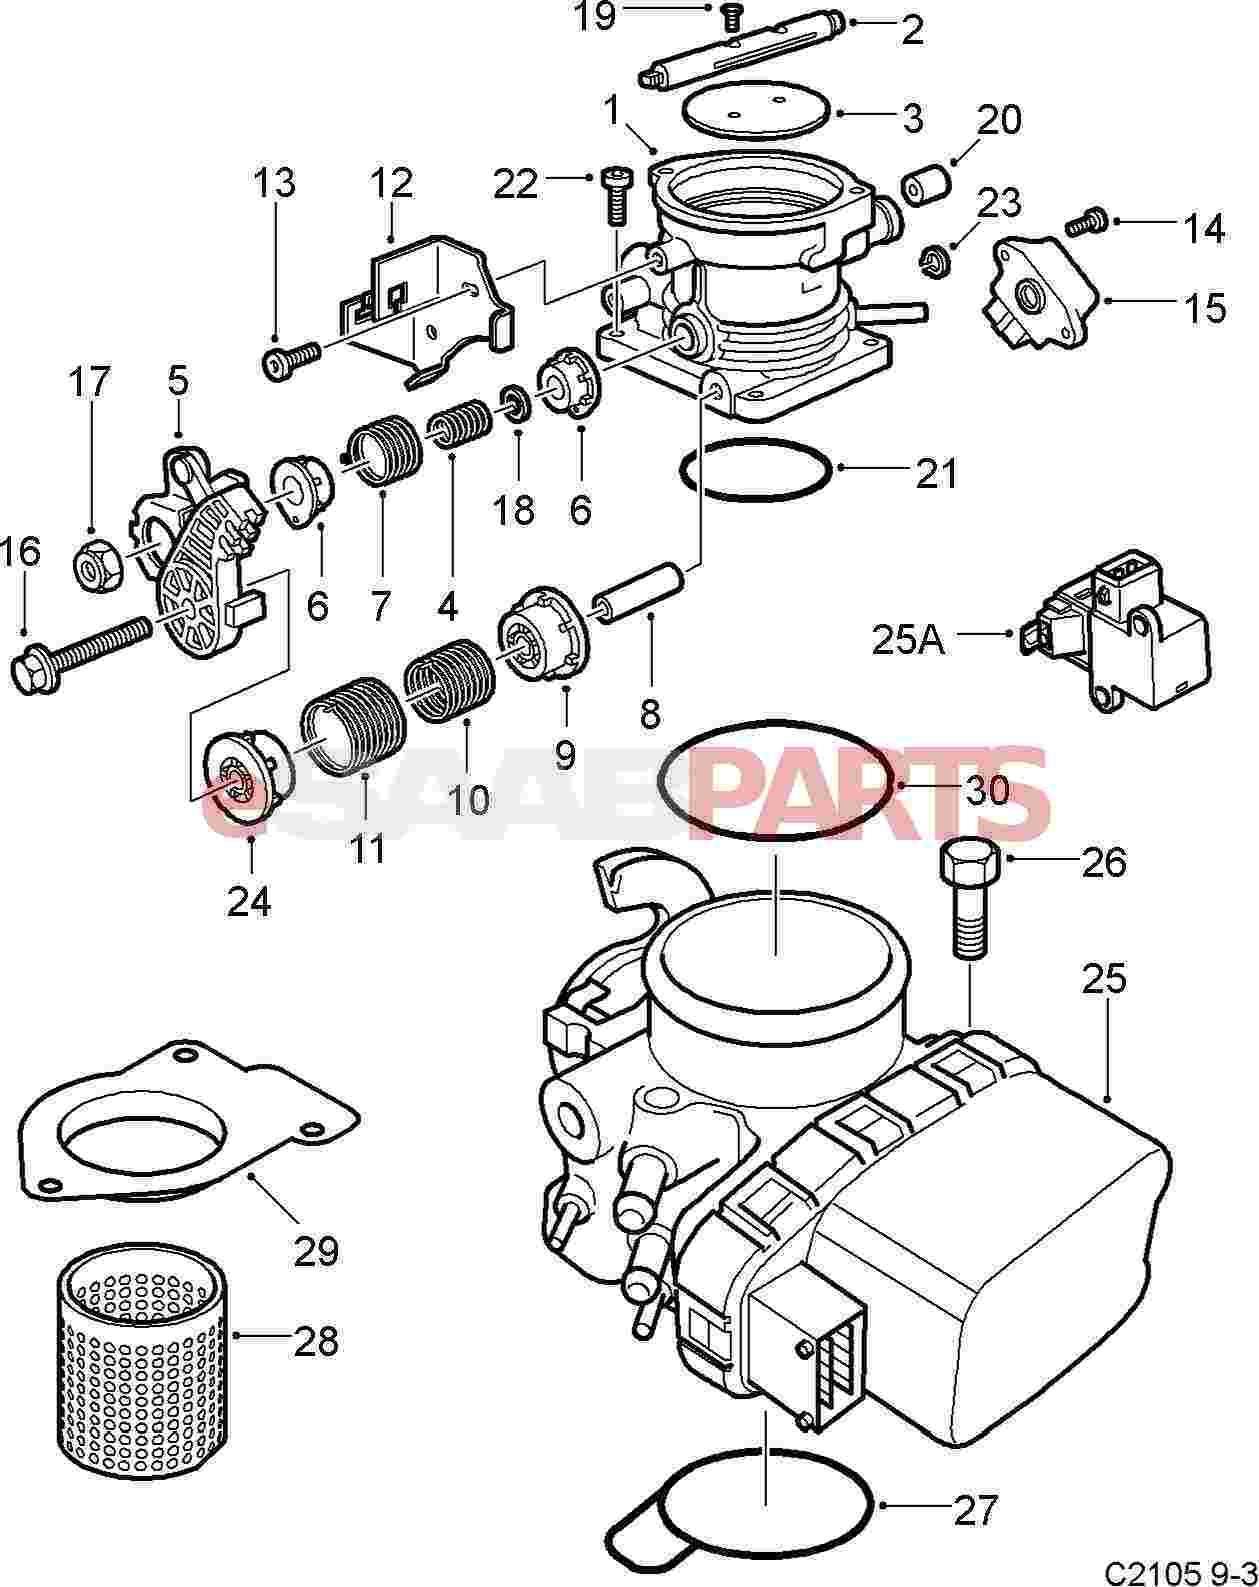 Diagram image 25a